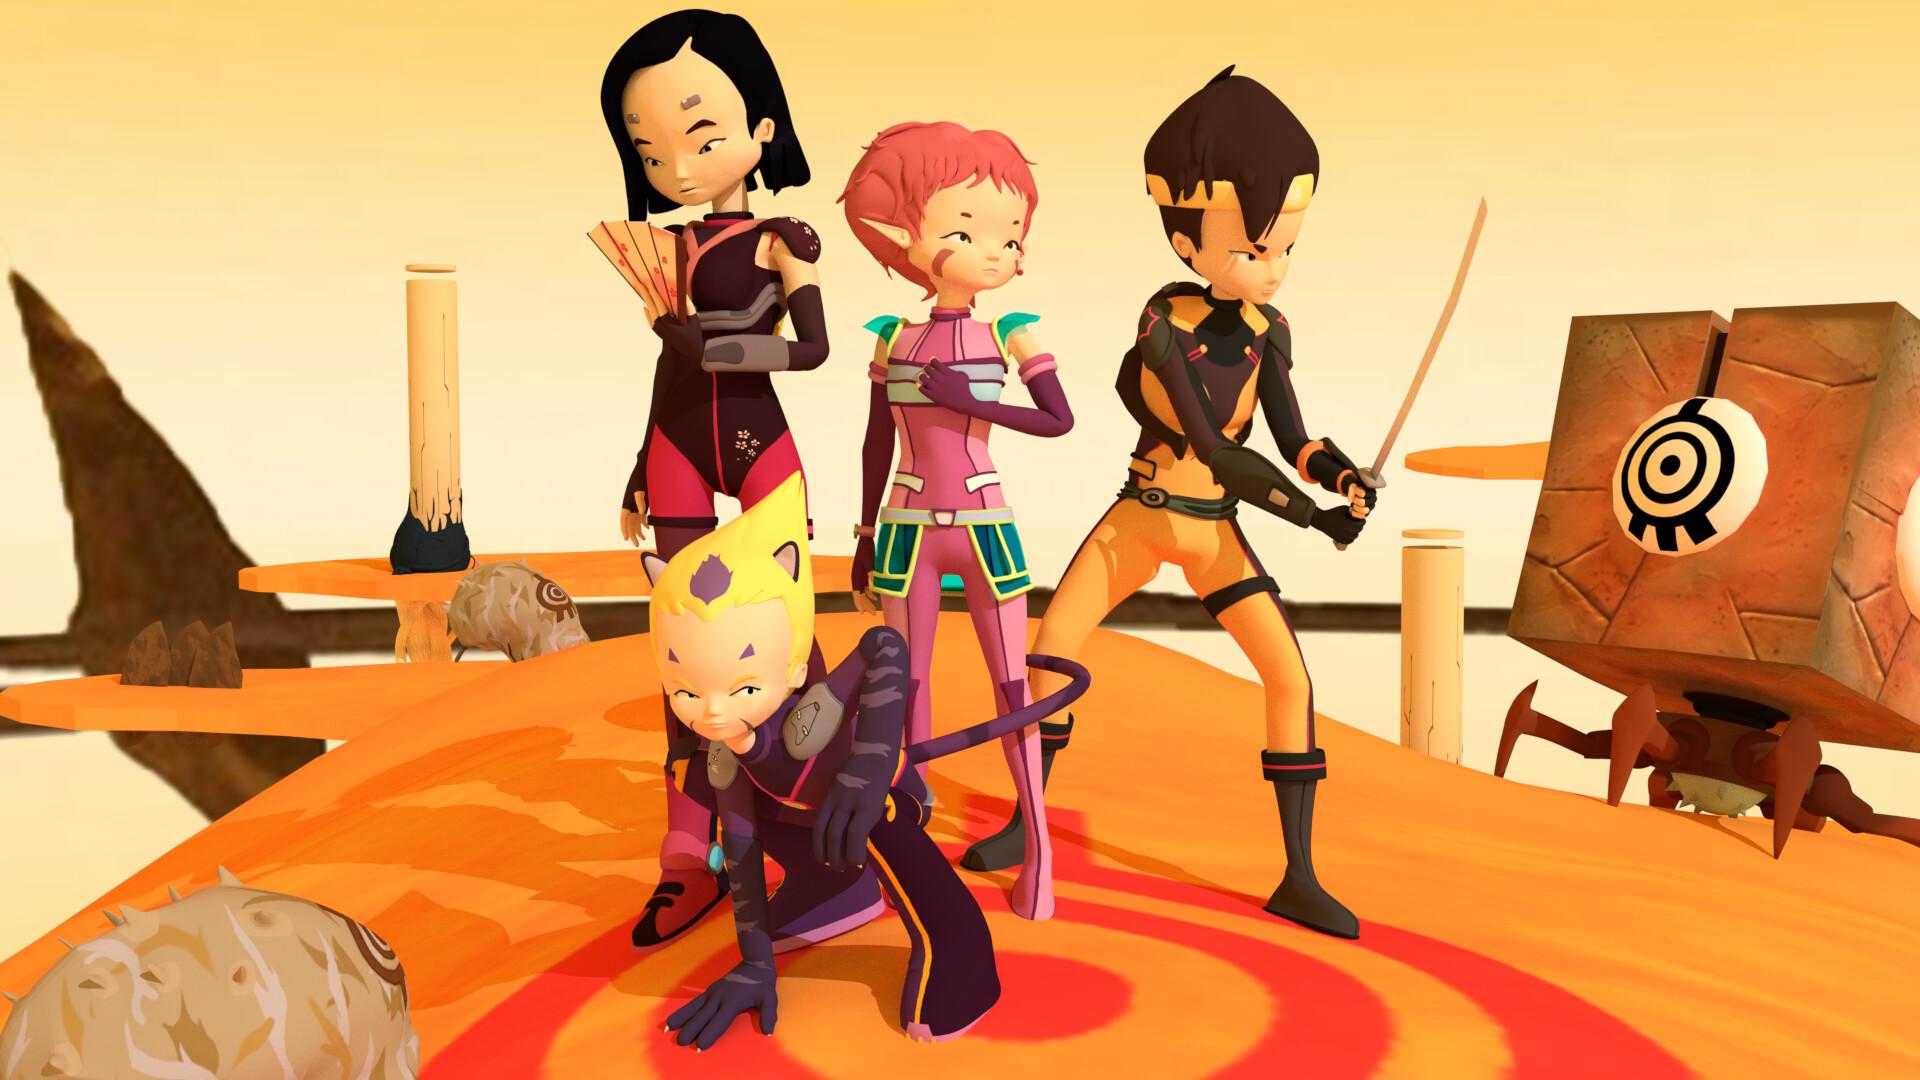 Aelita, Yummi, Ulrich and Odd Della ready to strike as they arrive in Lyoko.